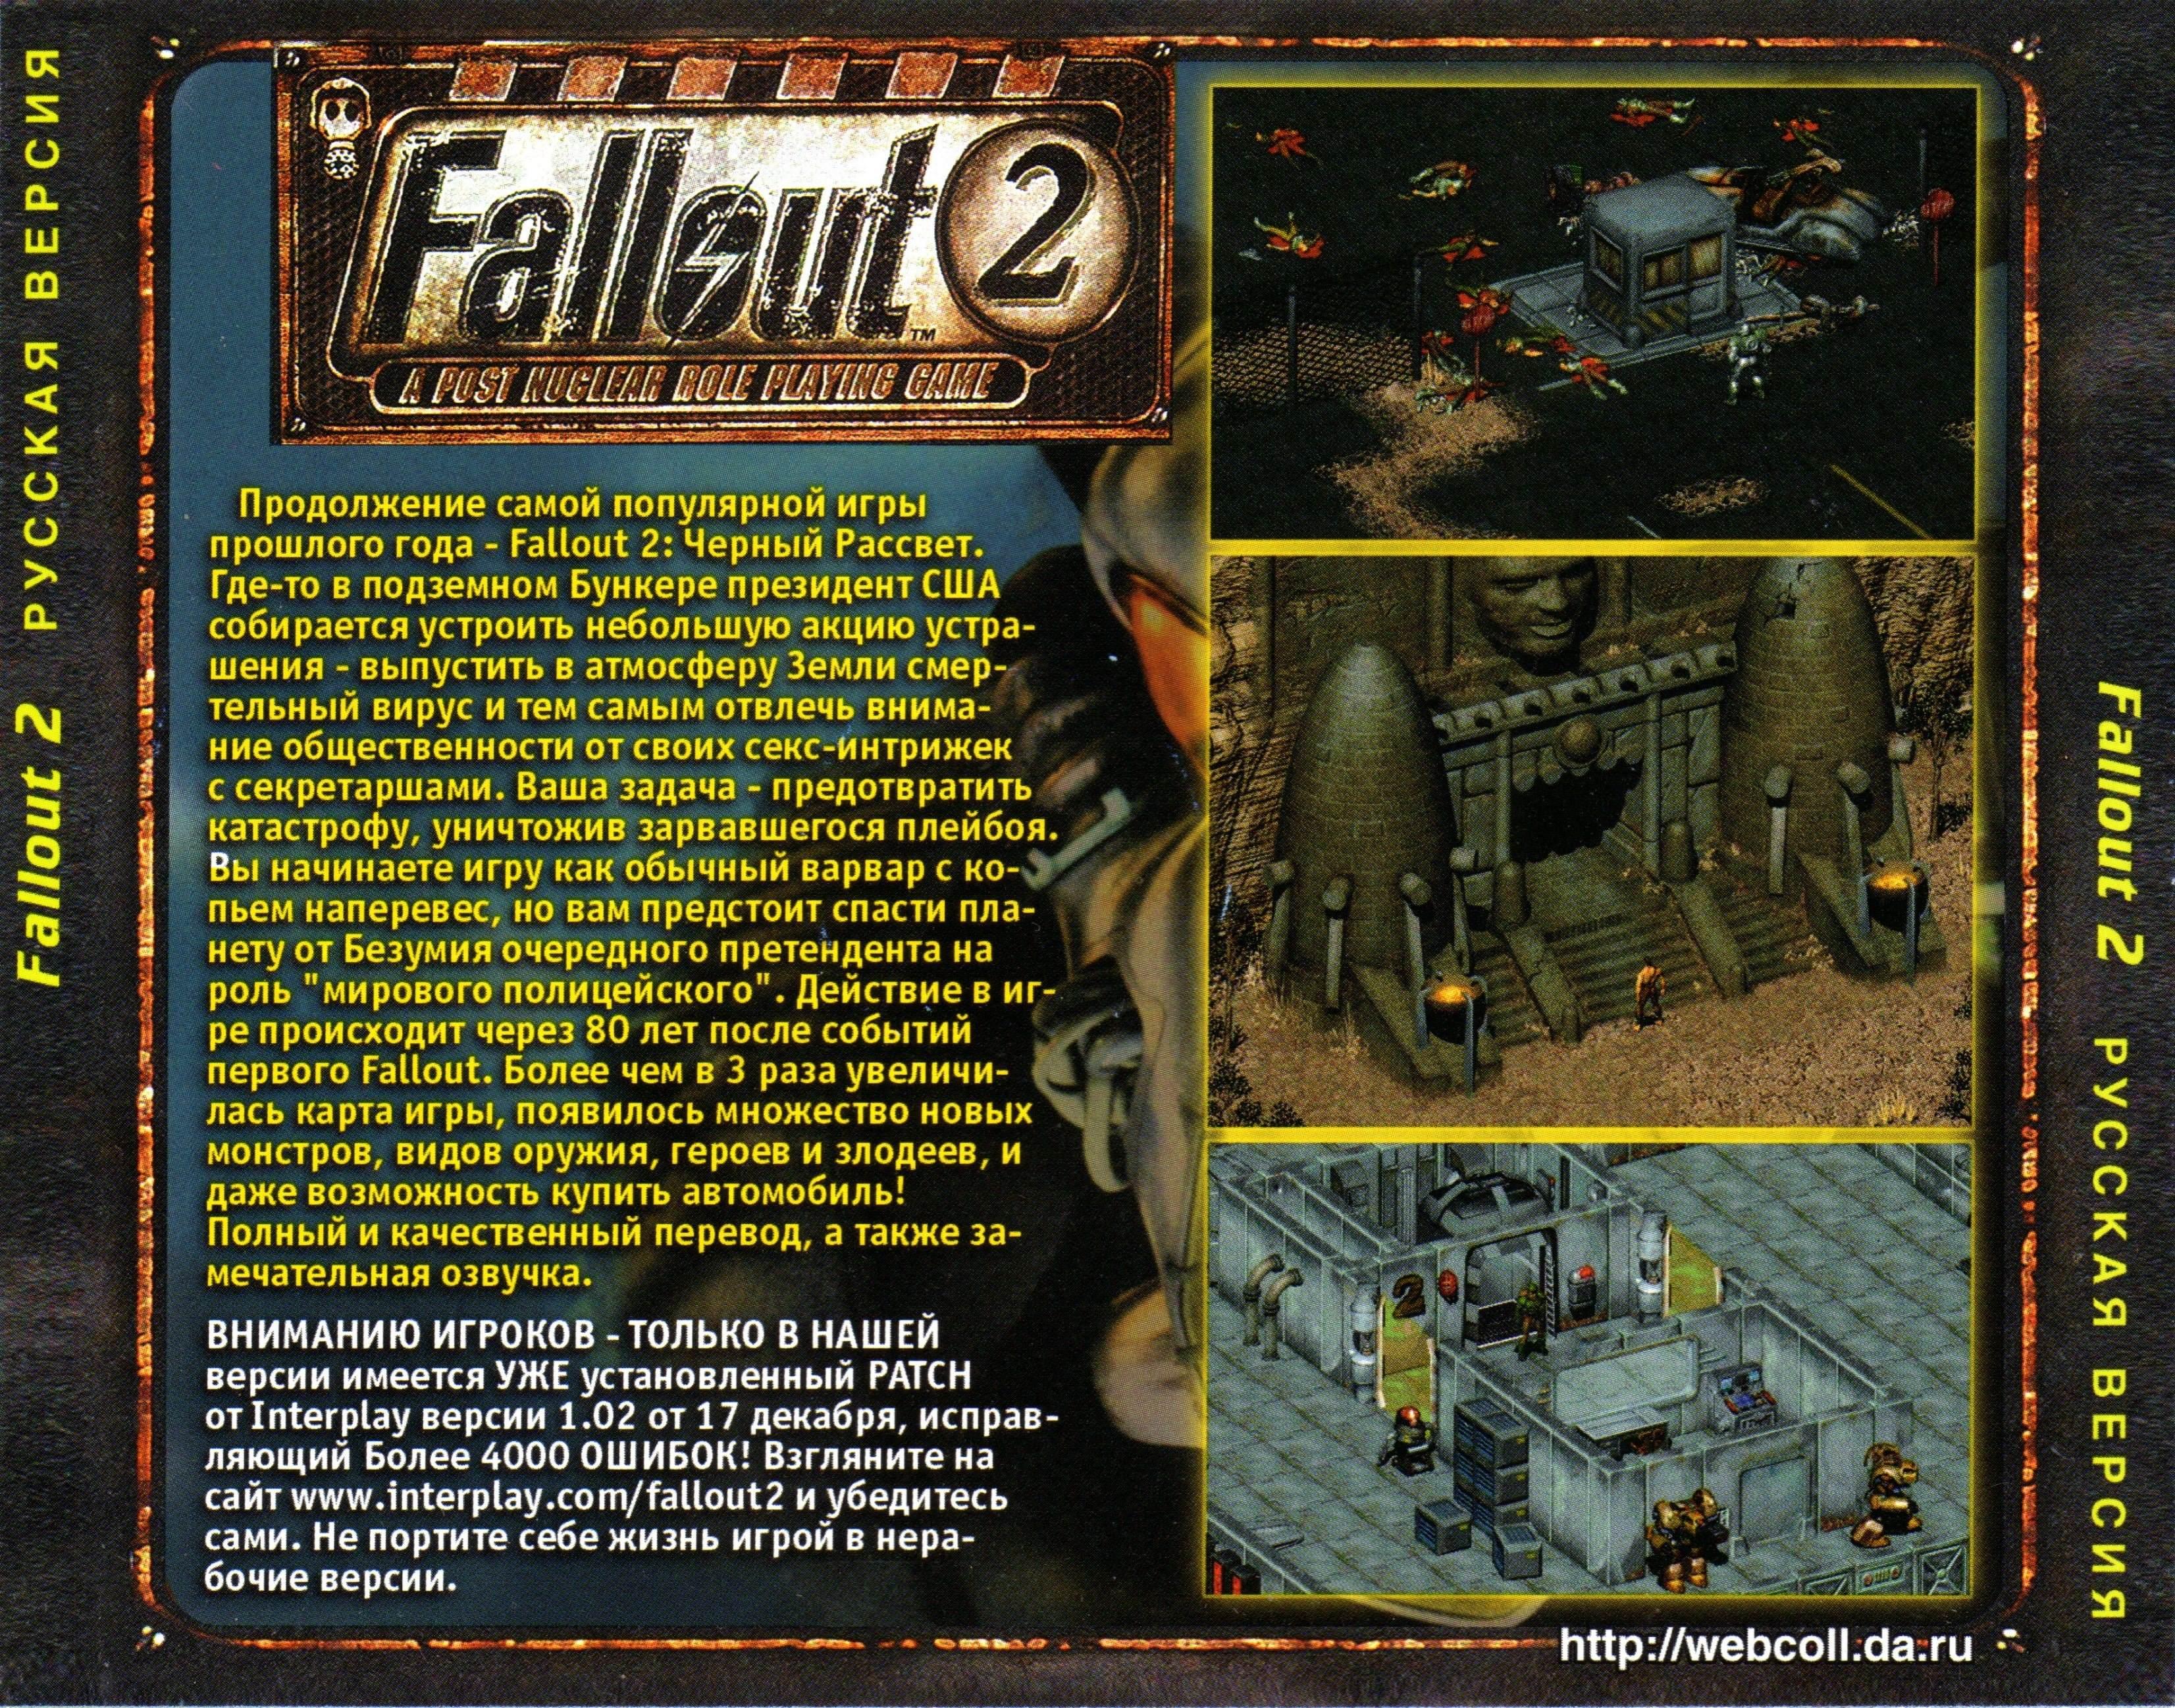 Fallout 2 (3).jpg]